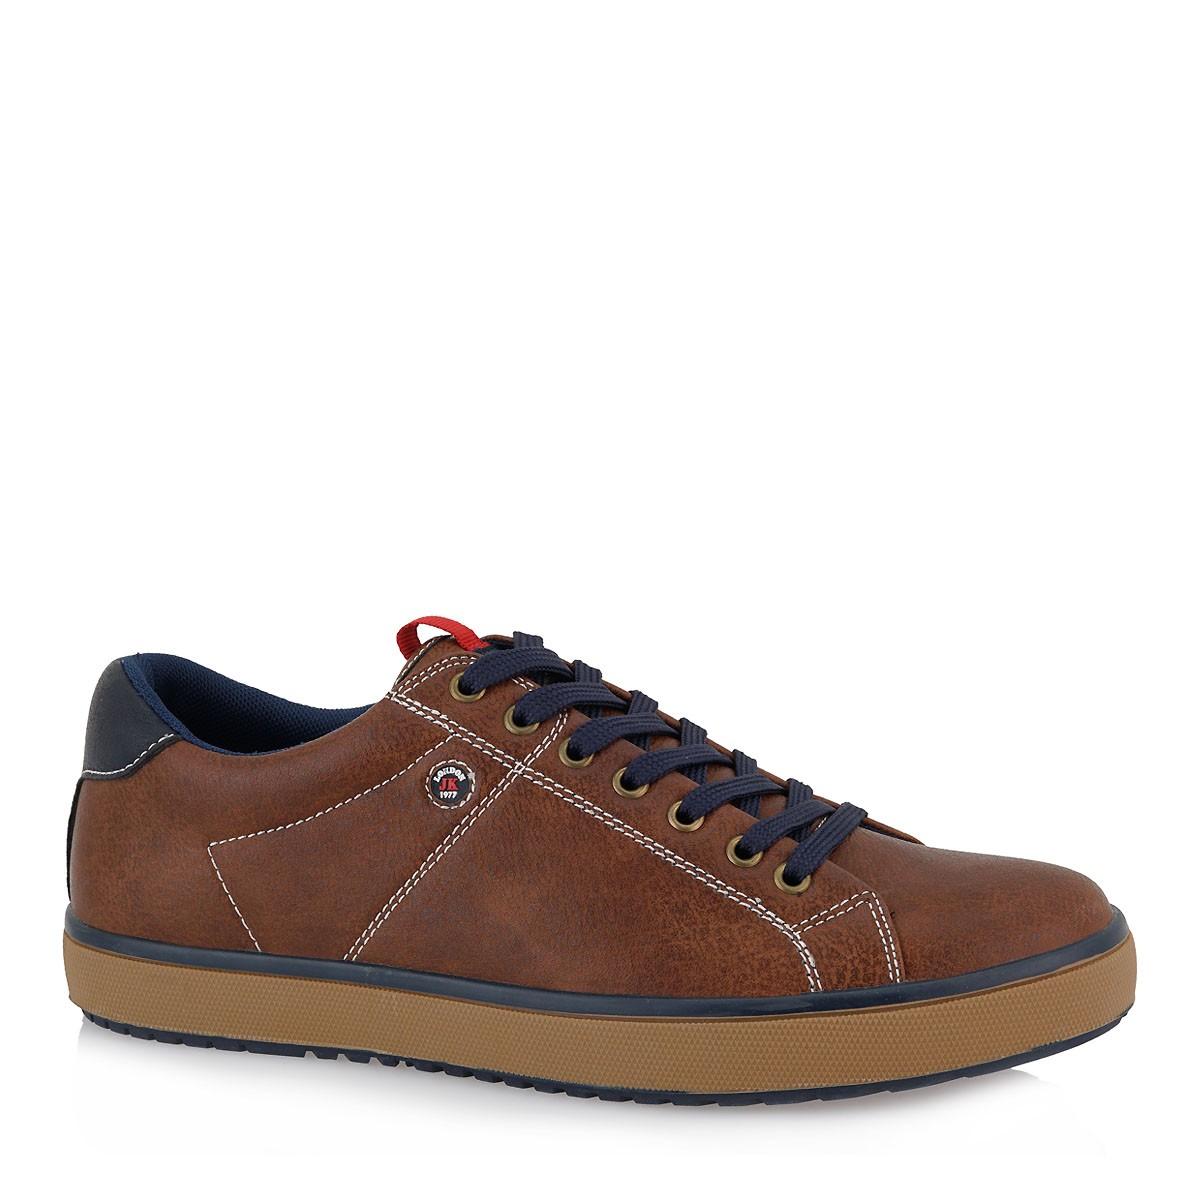 JK LONDON Ανδρικά παπούτσια Sneakers 268-700 Ταμπά L57002681531